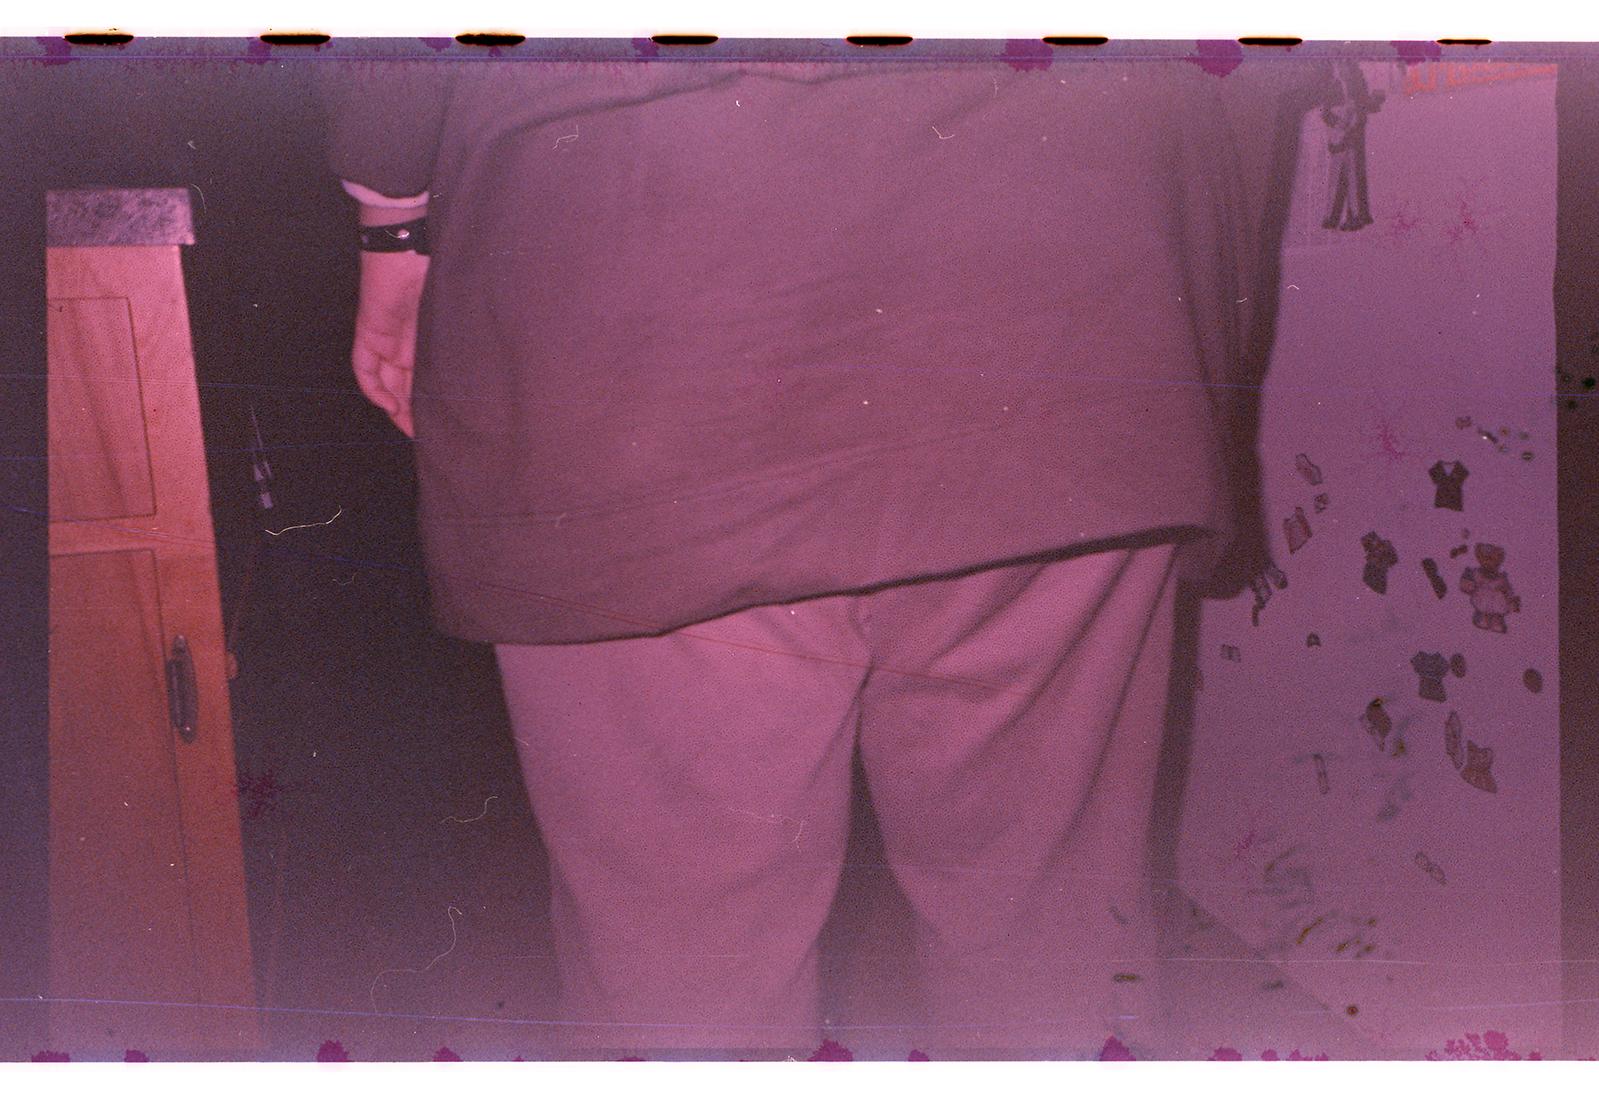 Amy Pence Brown 2 014.jpg